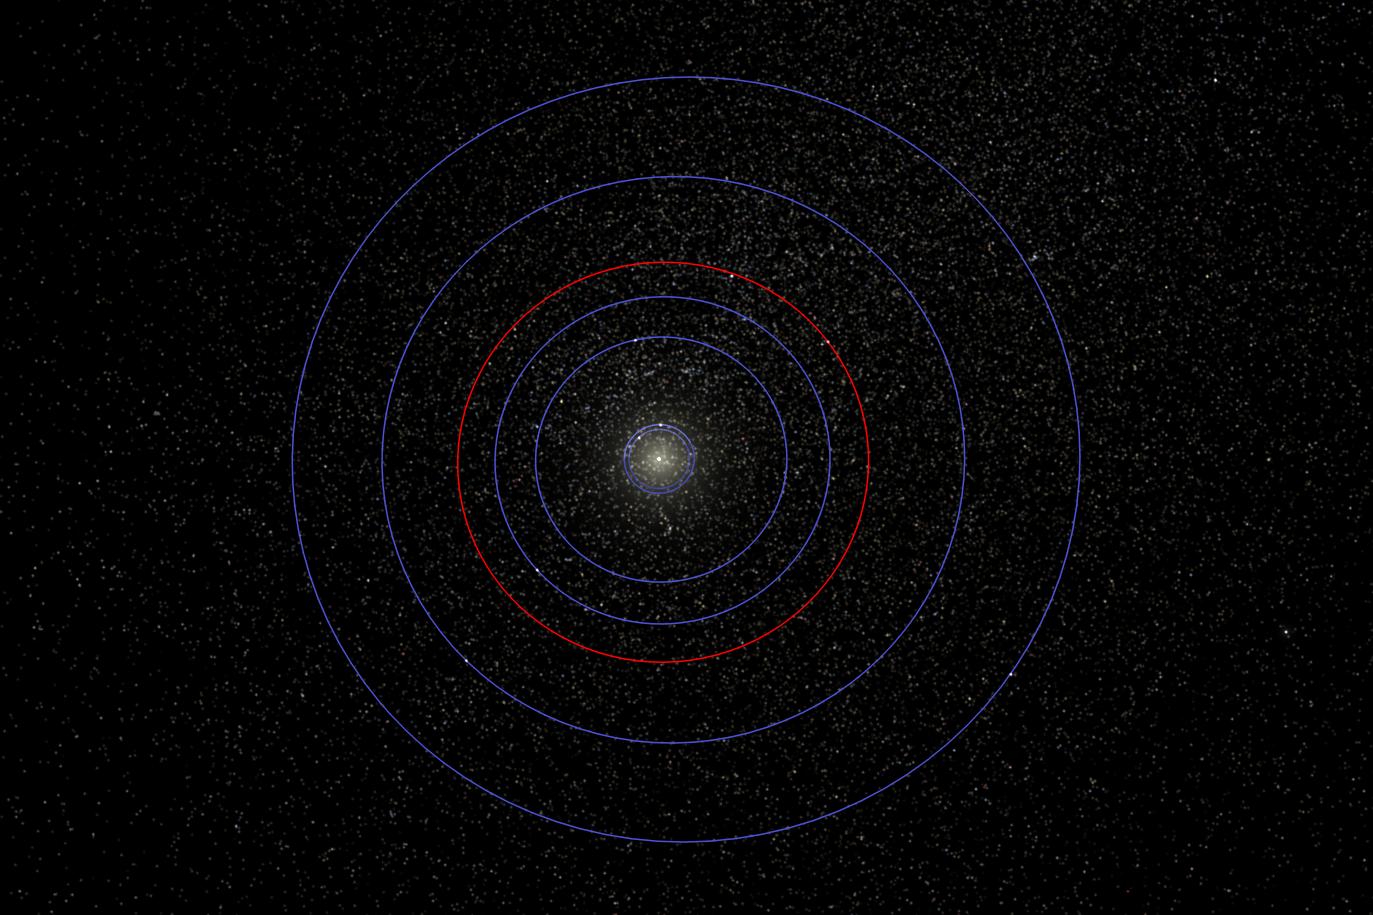 screenshot-2013-11-04-12-57-56